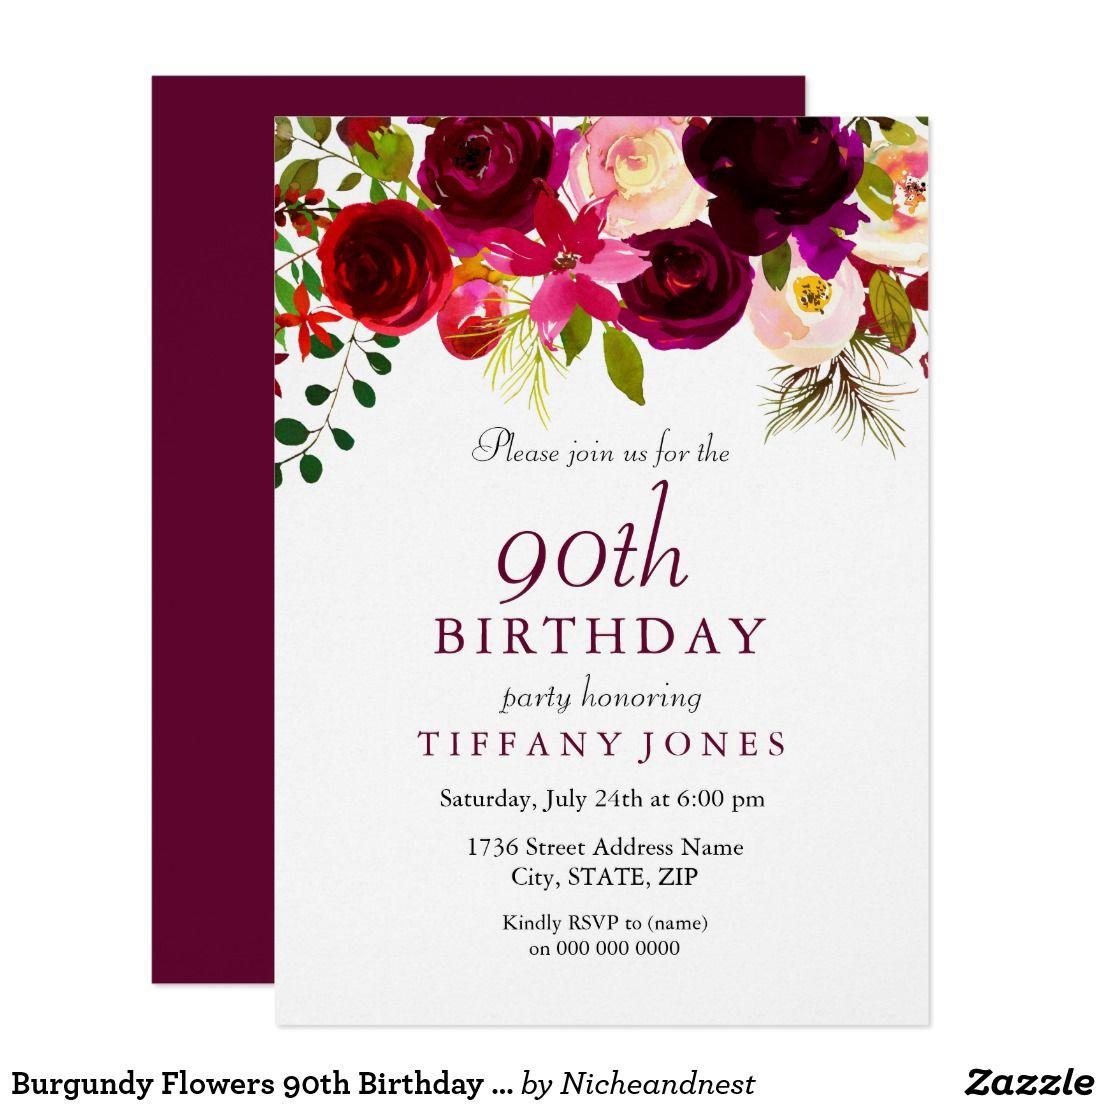 Burgundy Flowers 90th Birthday Party Invitation   90th birthday ...